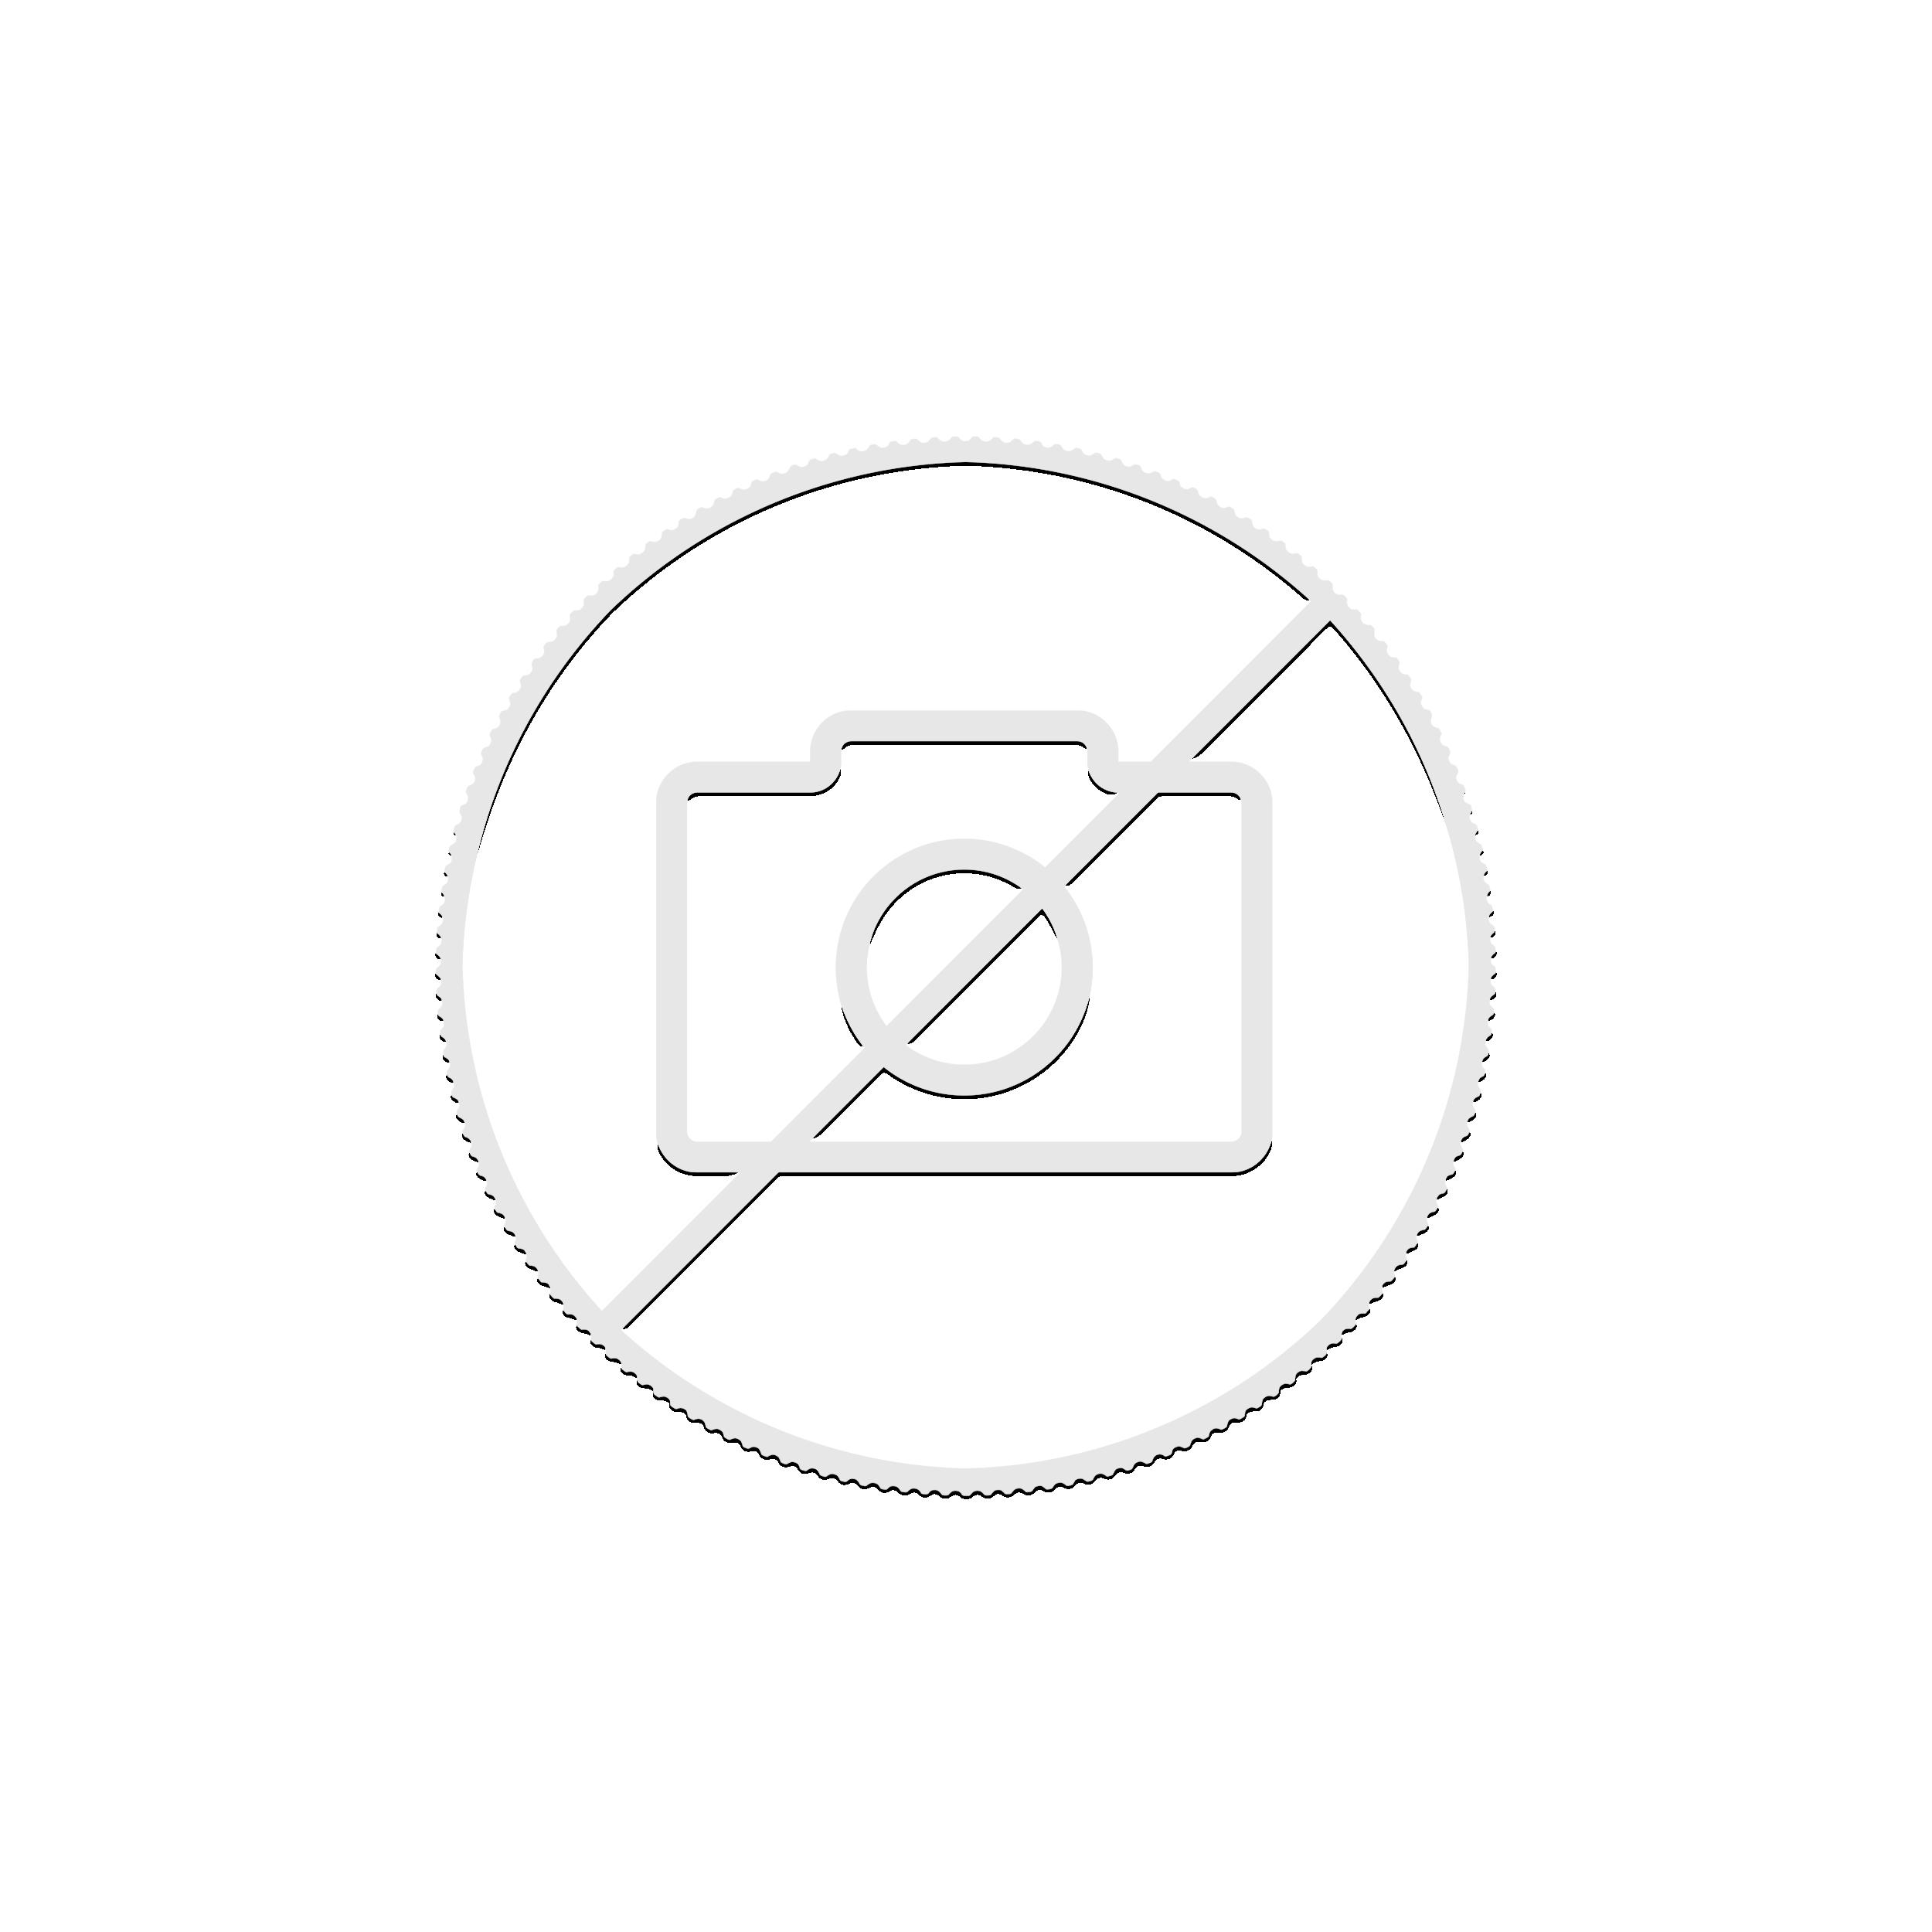 1 Troy ounce zilveren munt Lynx - Predator serie 2017